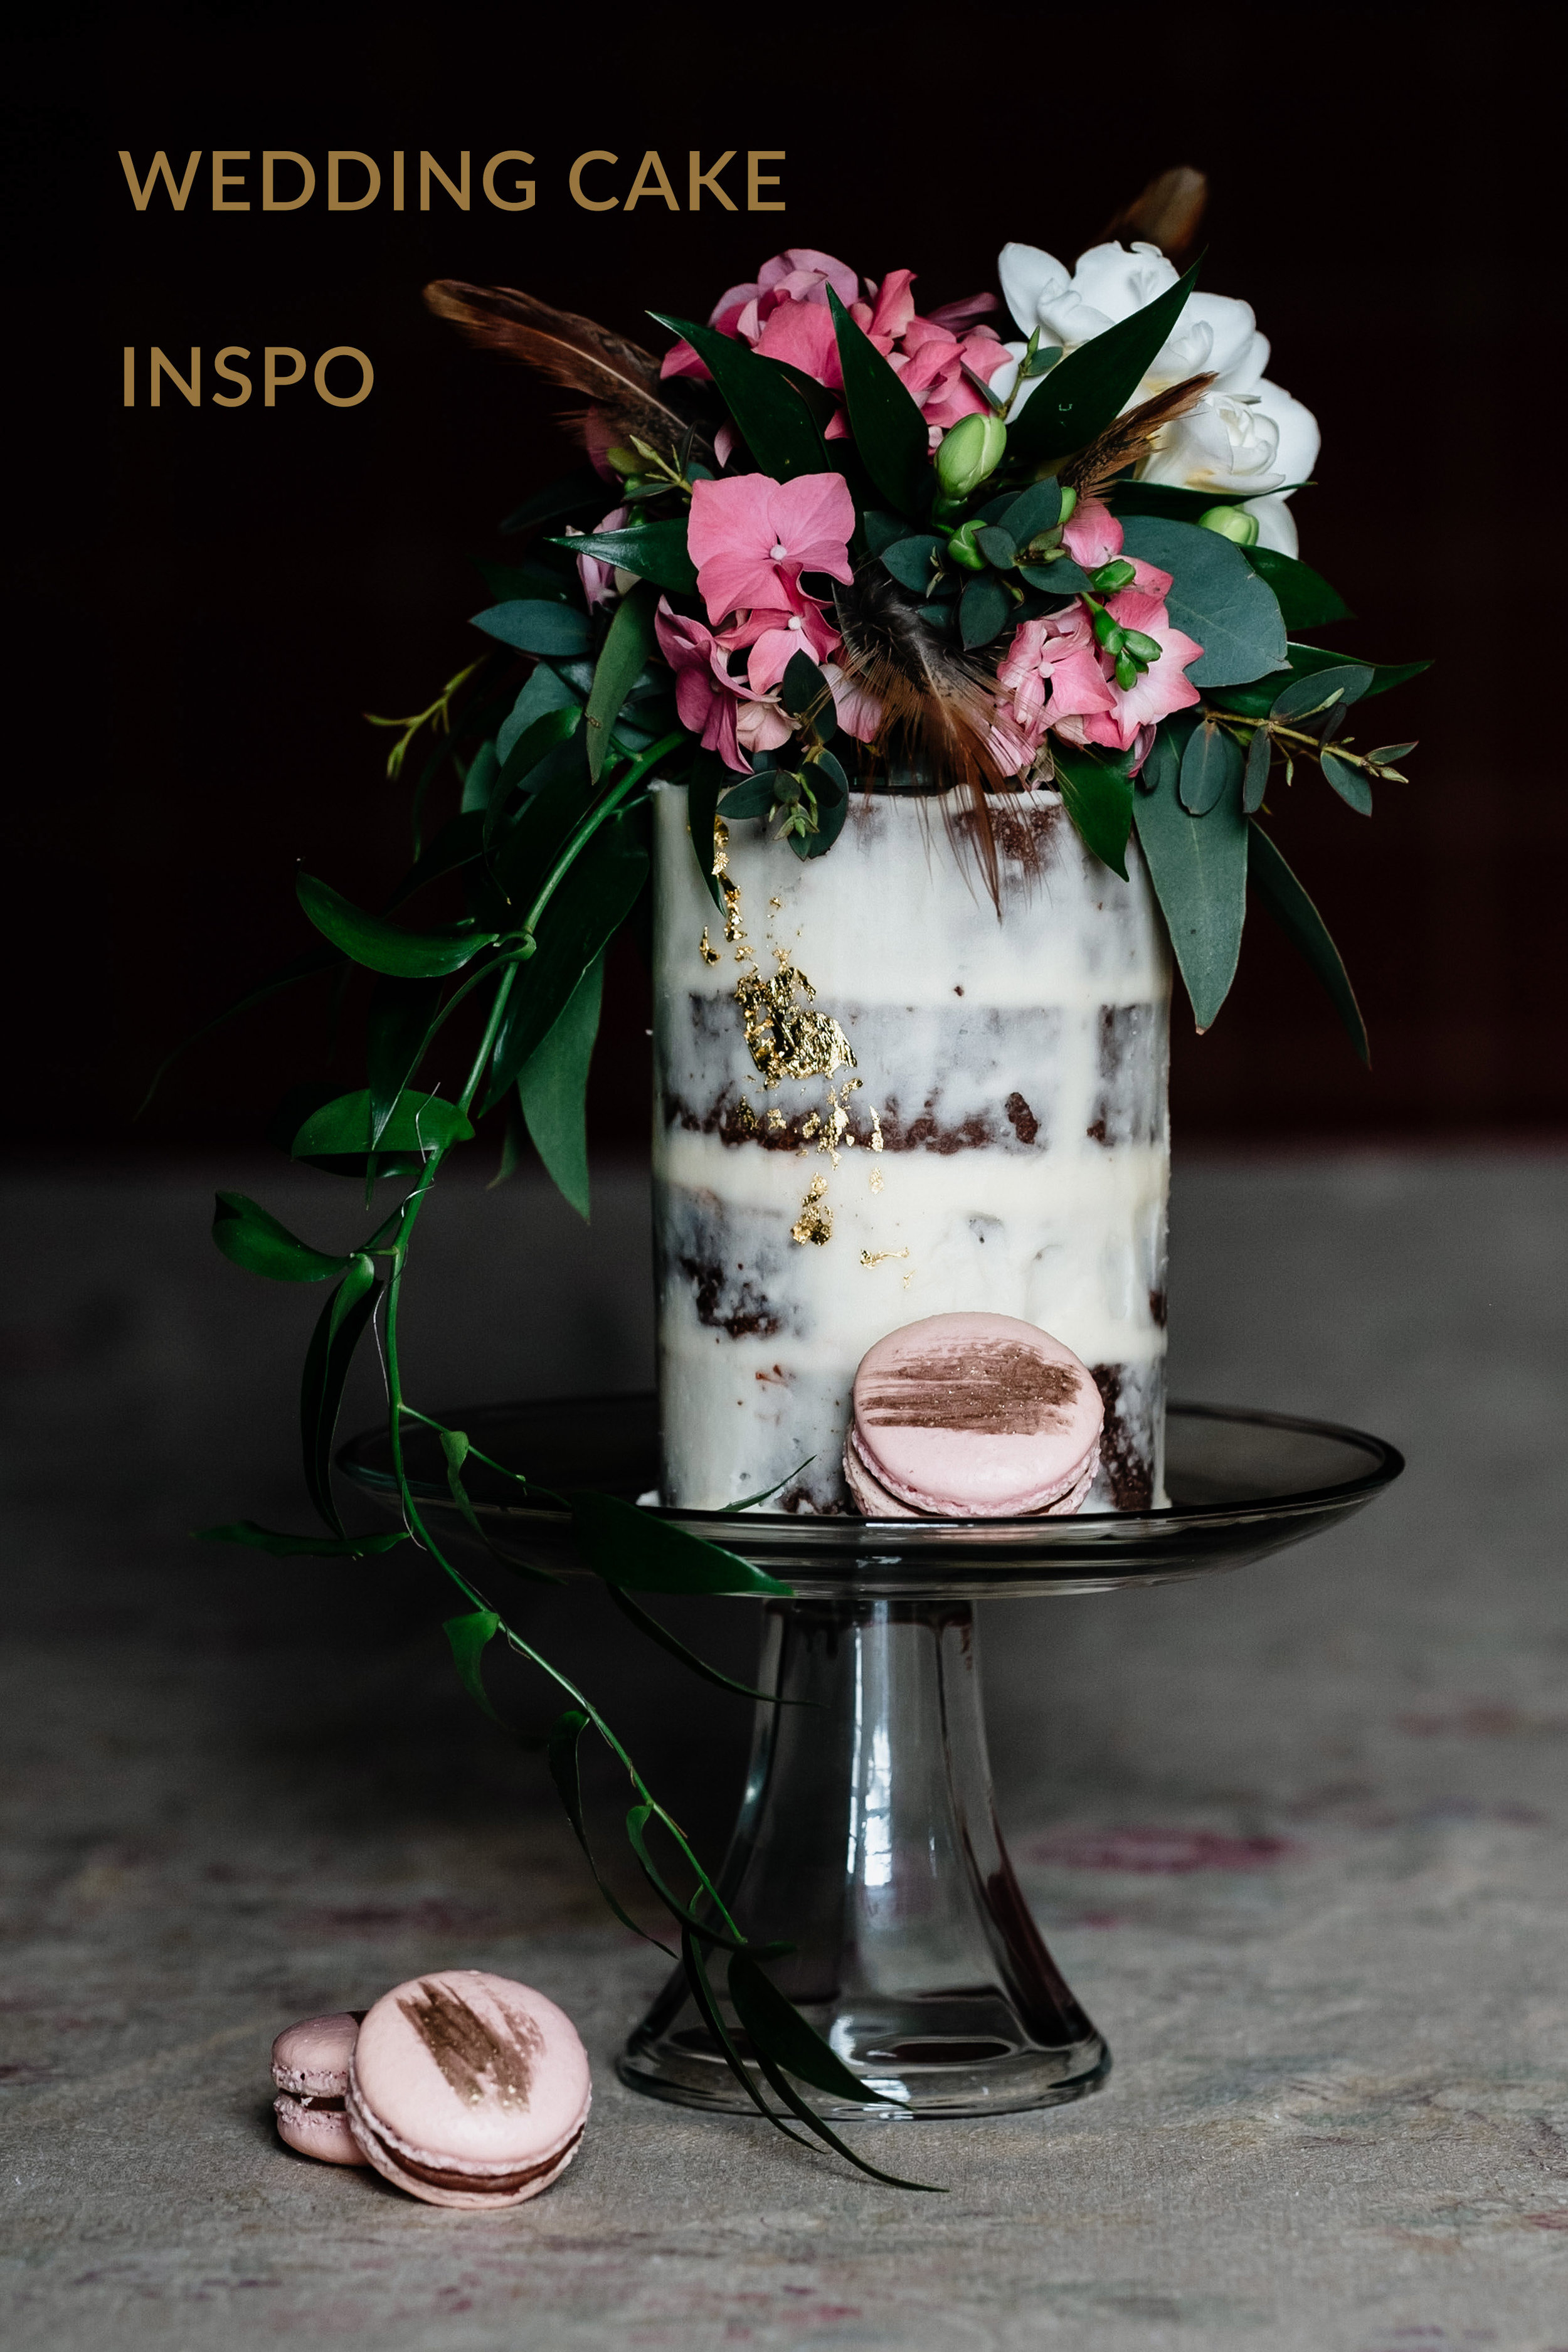 WEDDING-CAKE-SCOTLAND-INSPO.jpg